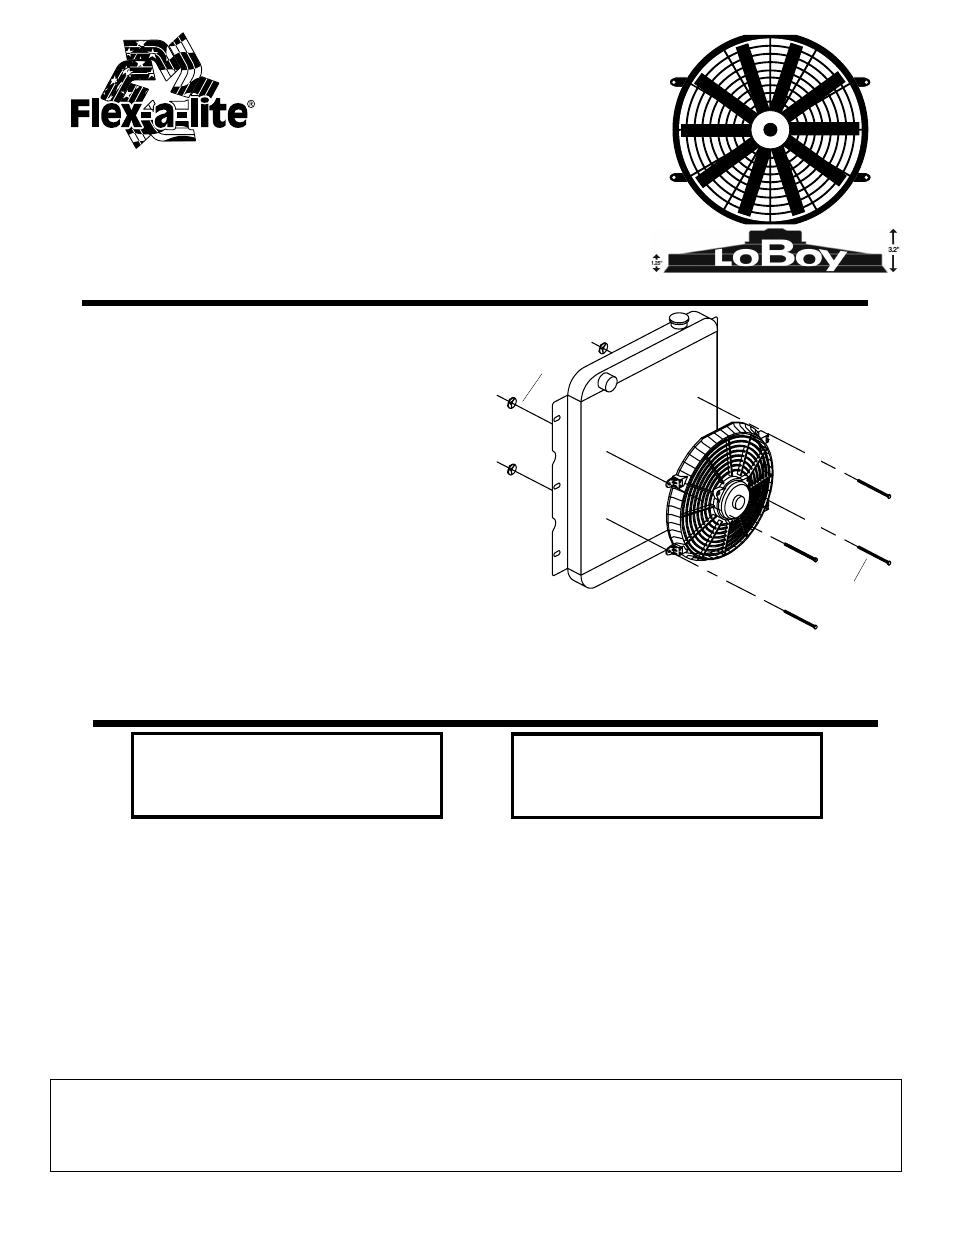 medium resolution of flex a lite 119 pusher loboy electric fan user manual 1 page flex a lite fan controller wiring diagram flex fan wiring